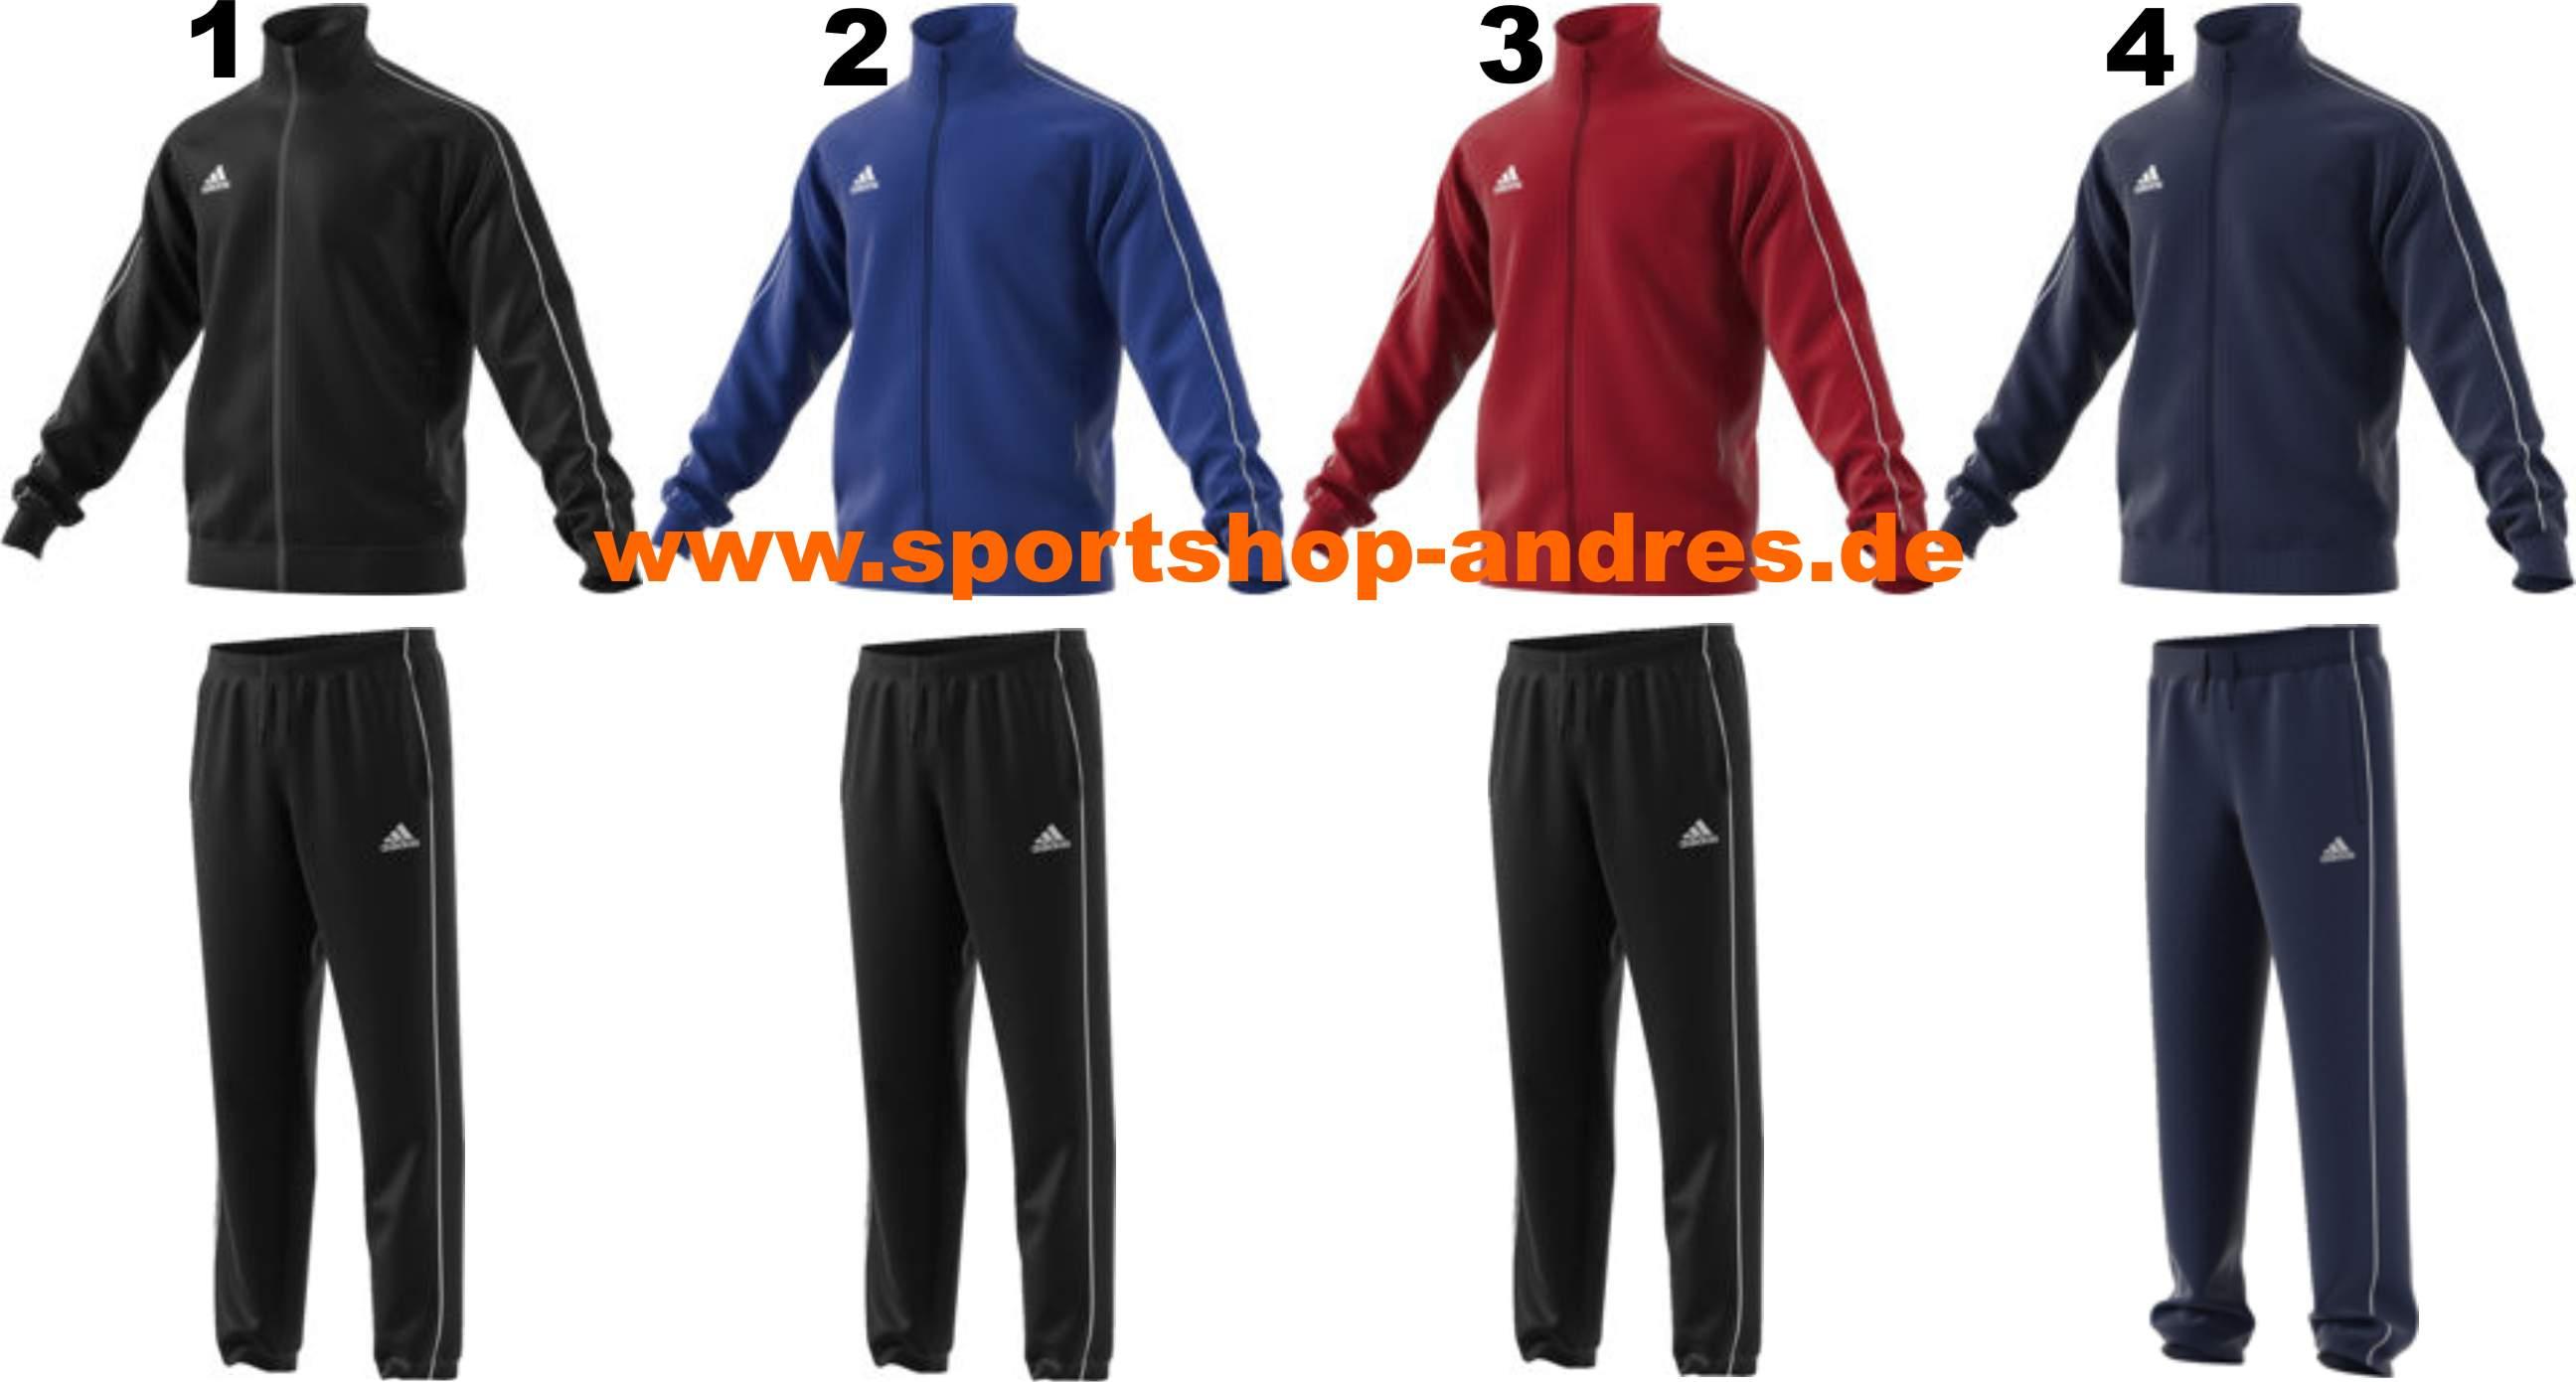 Sportshop Andres Adidas Core 18 Polyesteranzug für Kinder